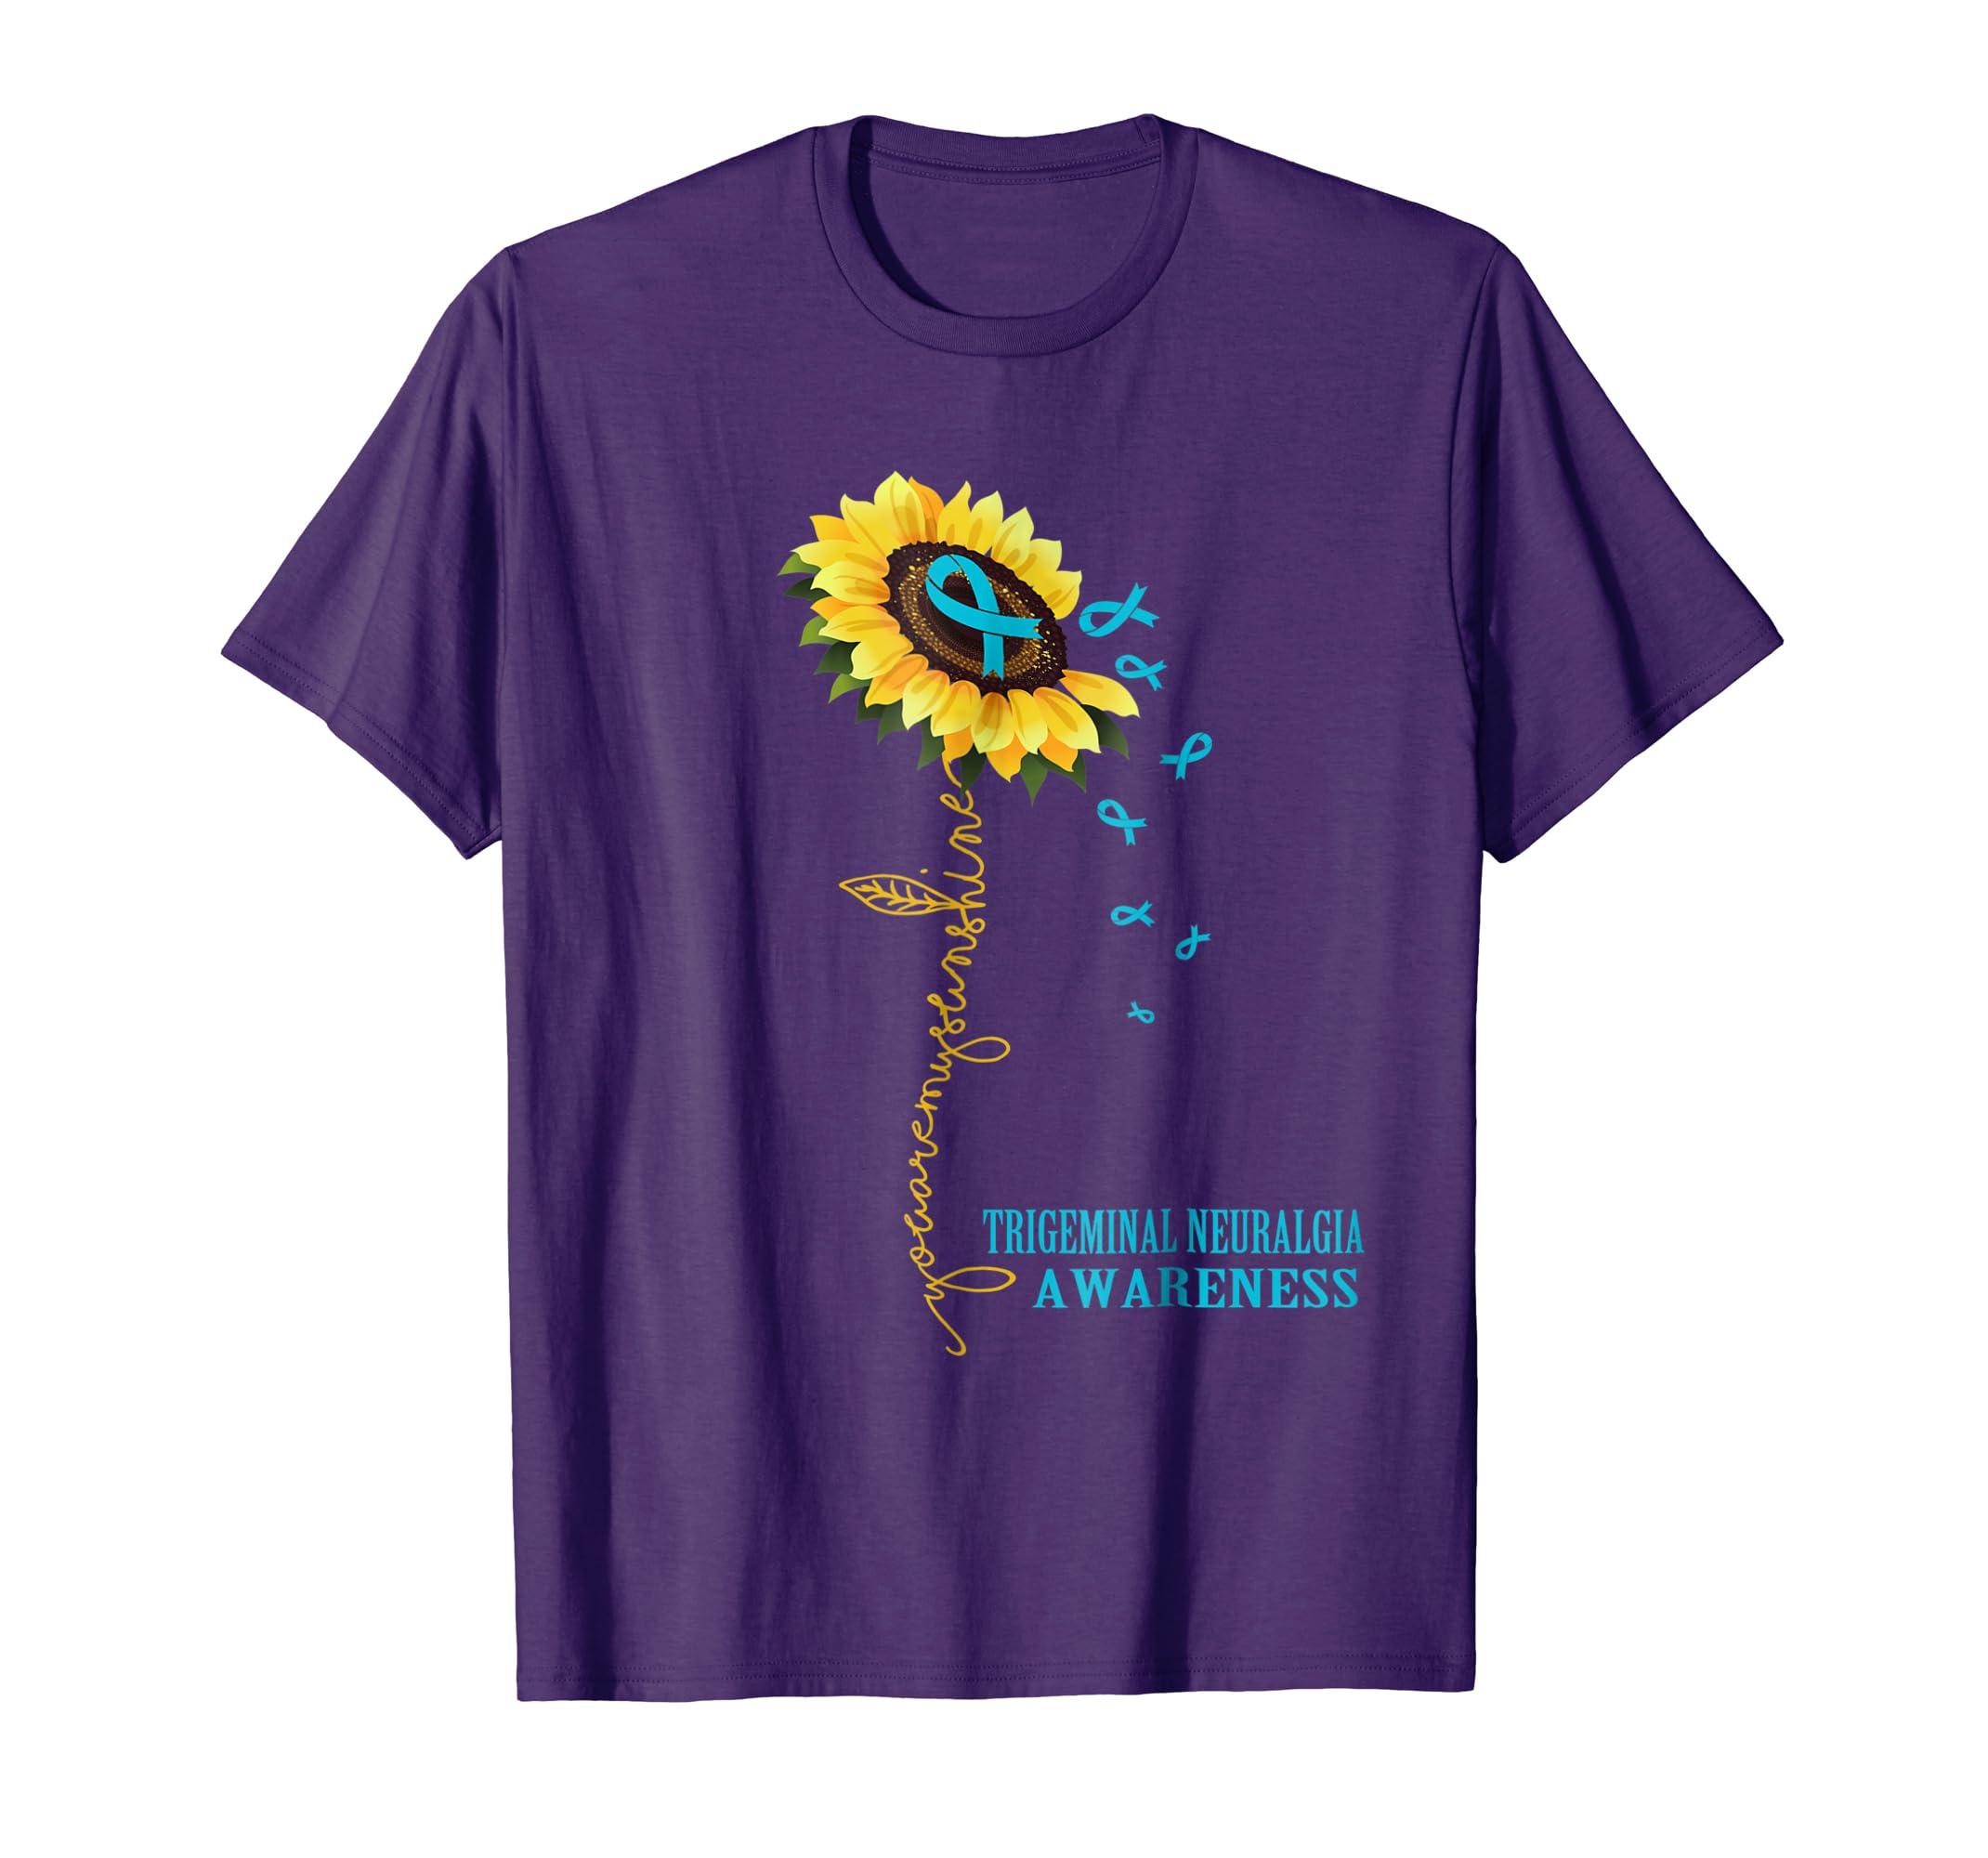 You Are My Sunshine Shirt Trigeminal Neuralgia Awareness-azvn